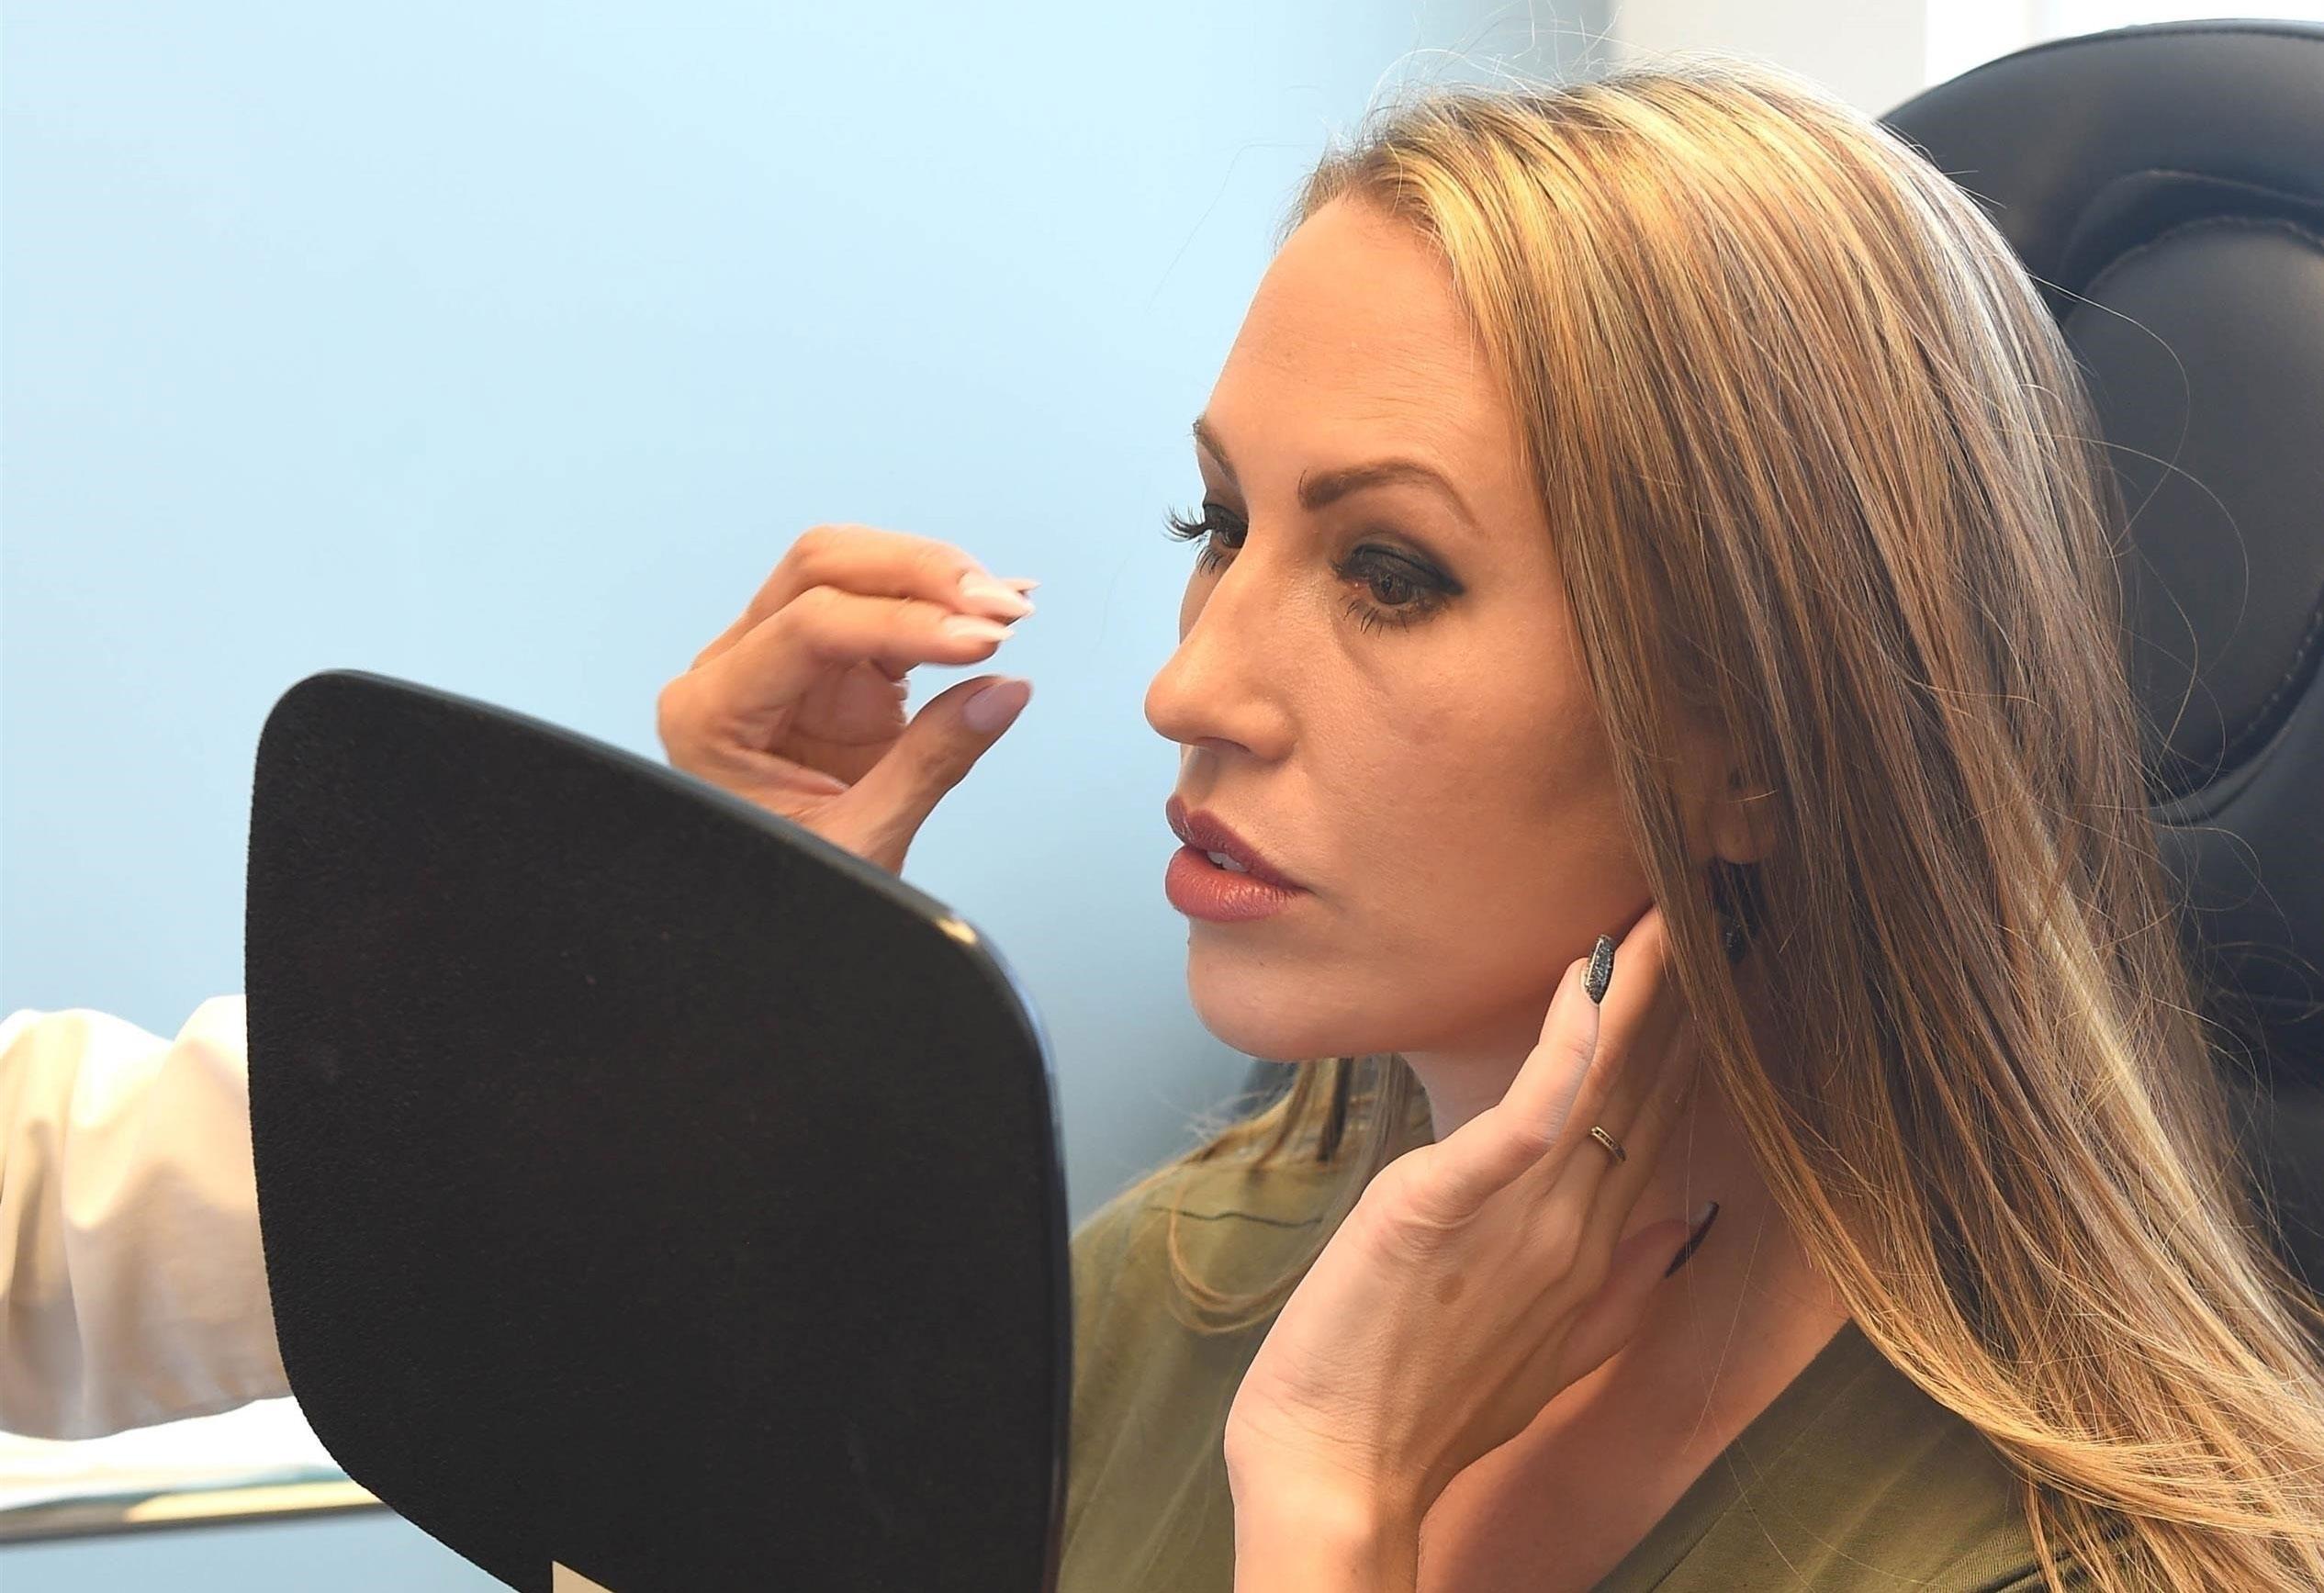 Melissa meeks revenge make continues split hot felon feature